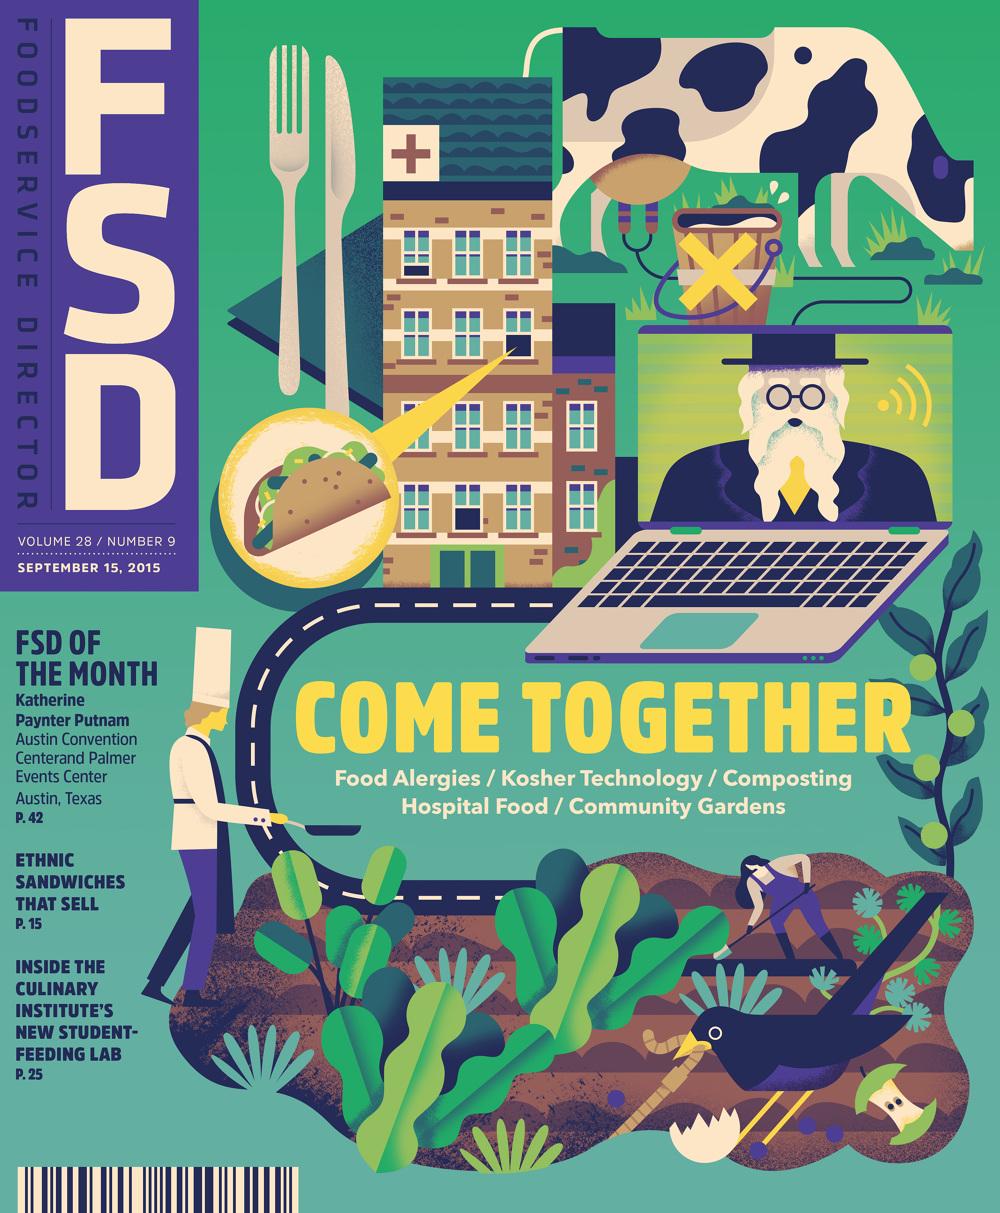 FSD-Cover-Chef-Taco-Knife-Fork-House-Cow-Laptop-Wheat-Bird_1000.jpg